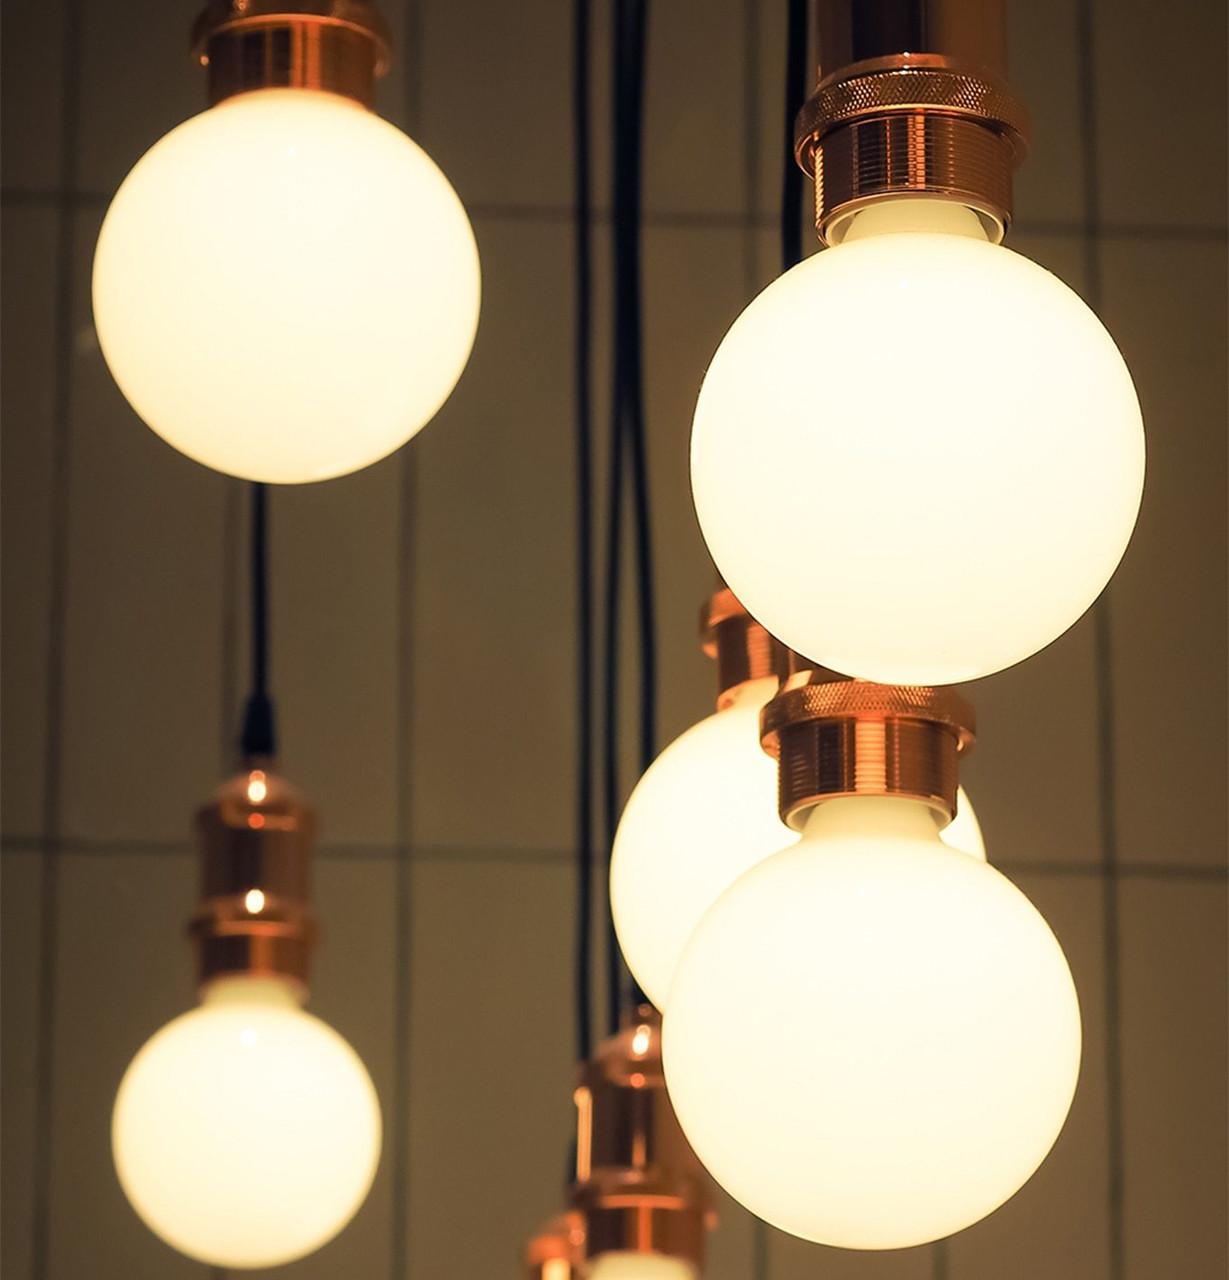 LED Dimmable G95 Antique Bronze Light Bulbs